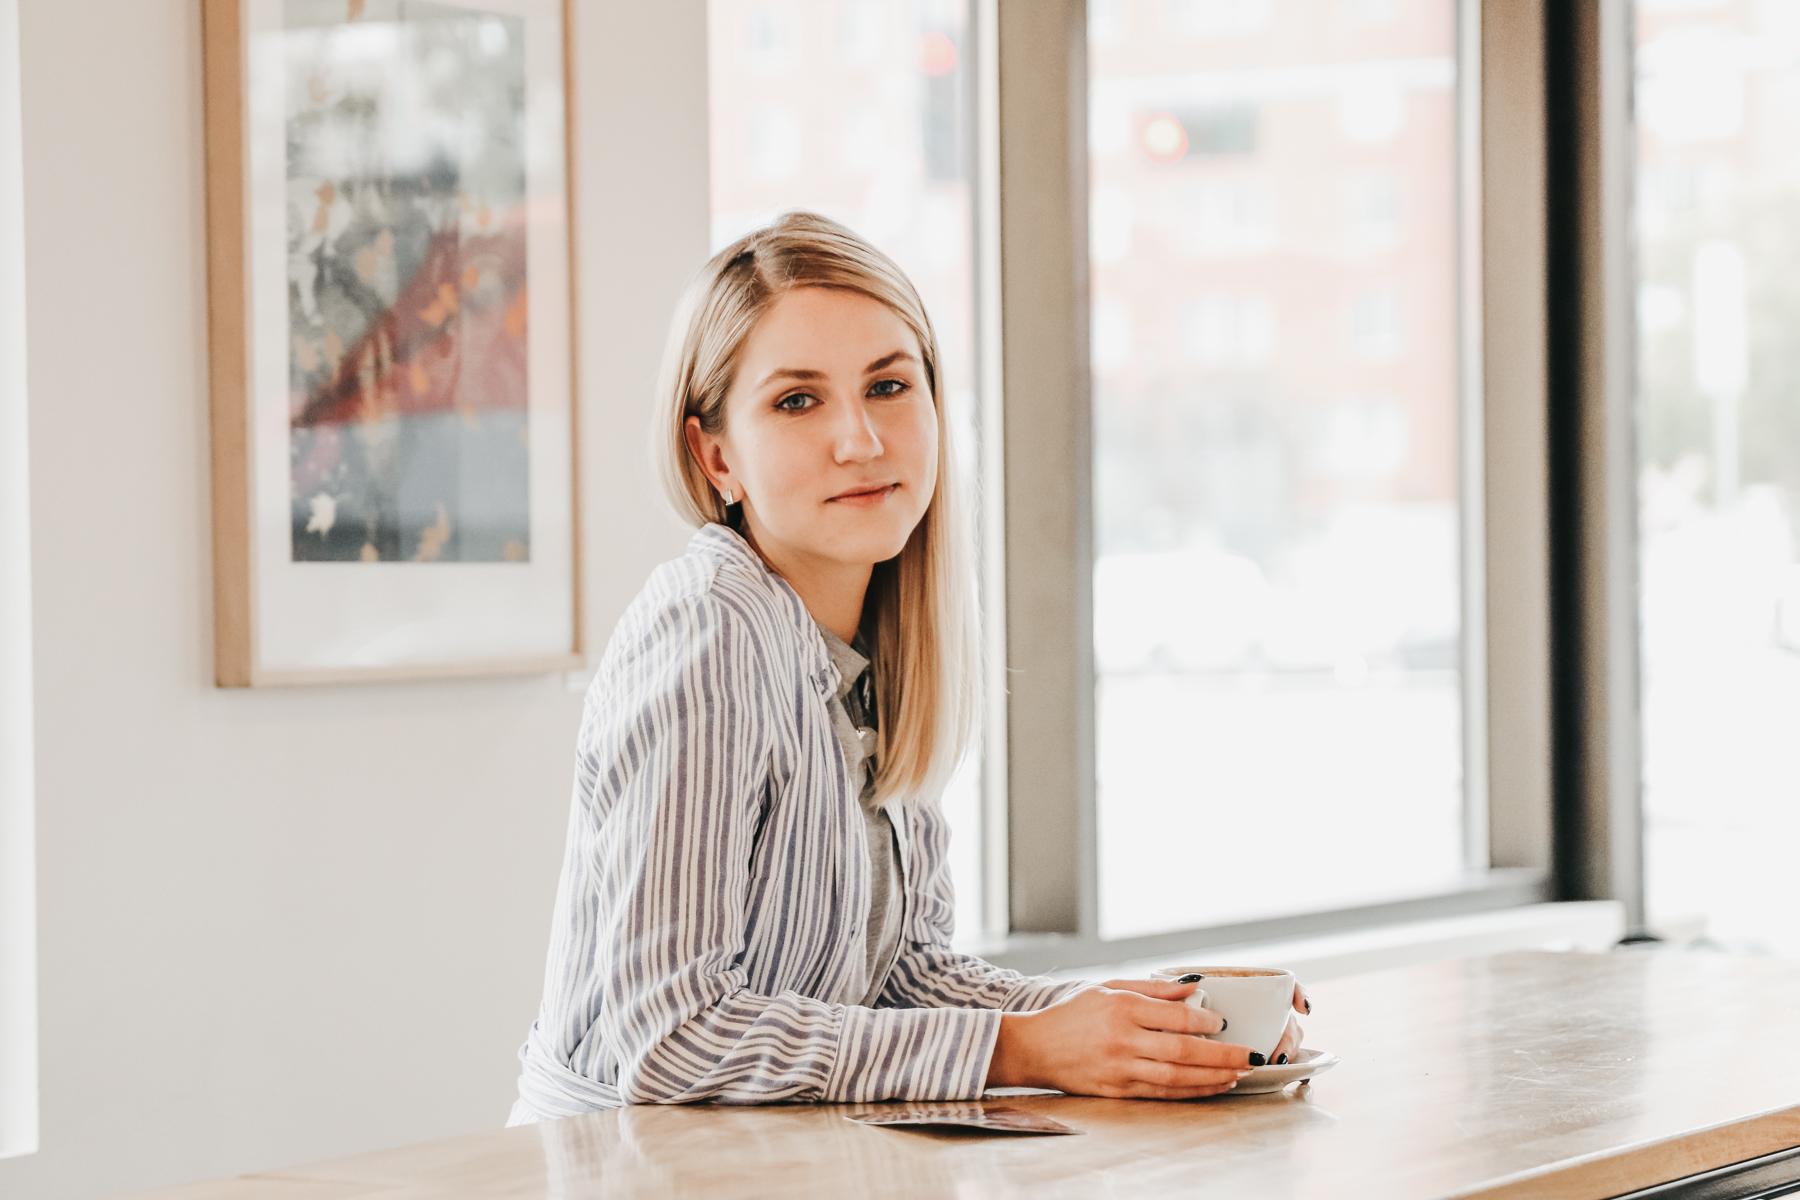 Anastasia Giancola INSPIRE YEG | Photo by Nicole Constante | Edmonton business startup_-8.jpg